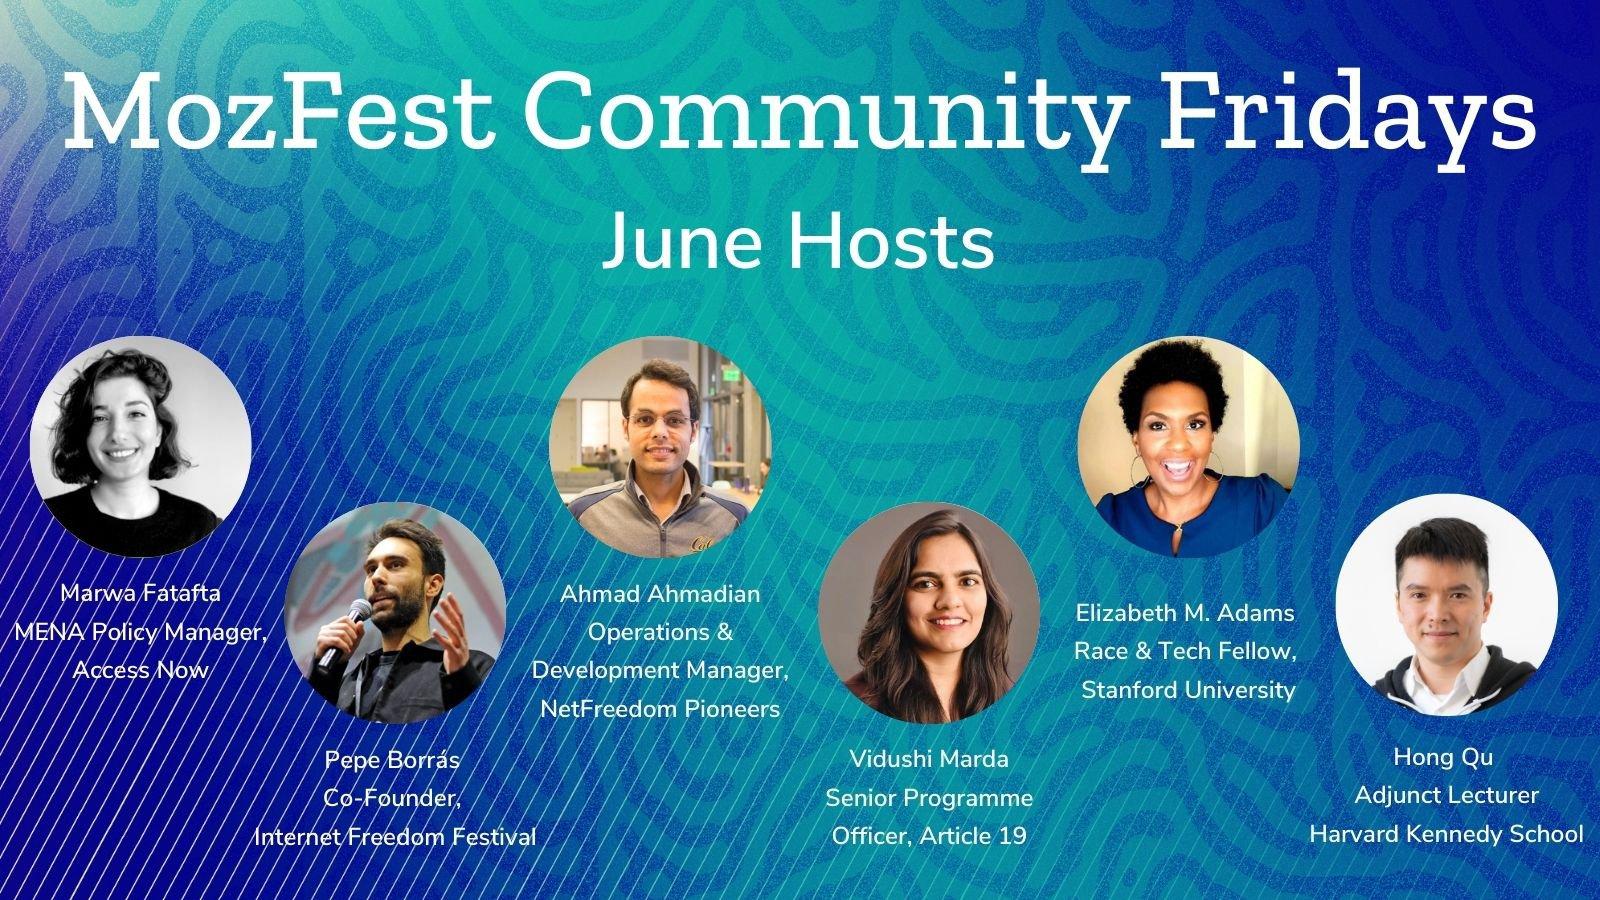 Blue and teal graphic with 6 headshots and white text: MozFest Community Fridays June Hosts: Marwa Fatafta, Pepe Borras, Ahmad Ahmadian, Vidushi Marda, Elizabeth M Adams, and Hong Qu